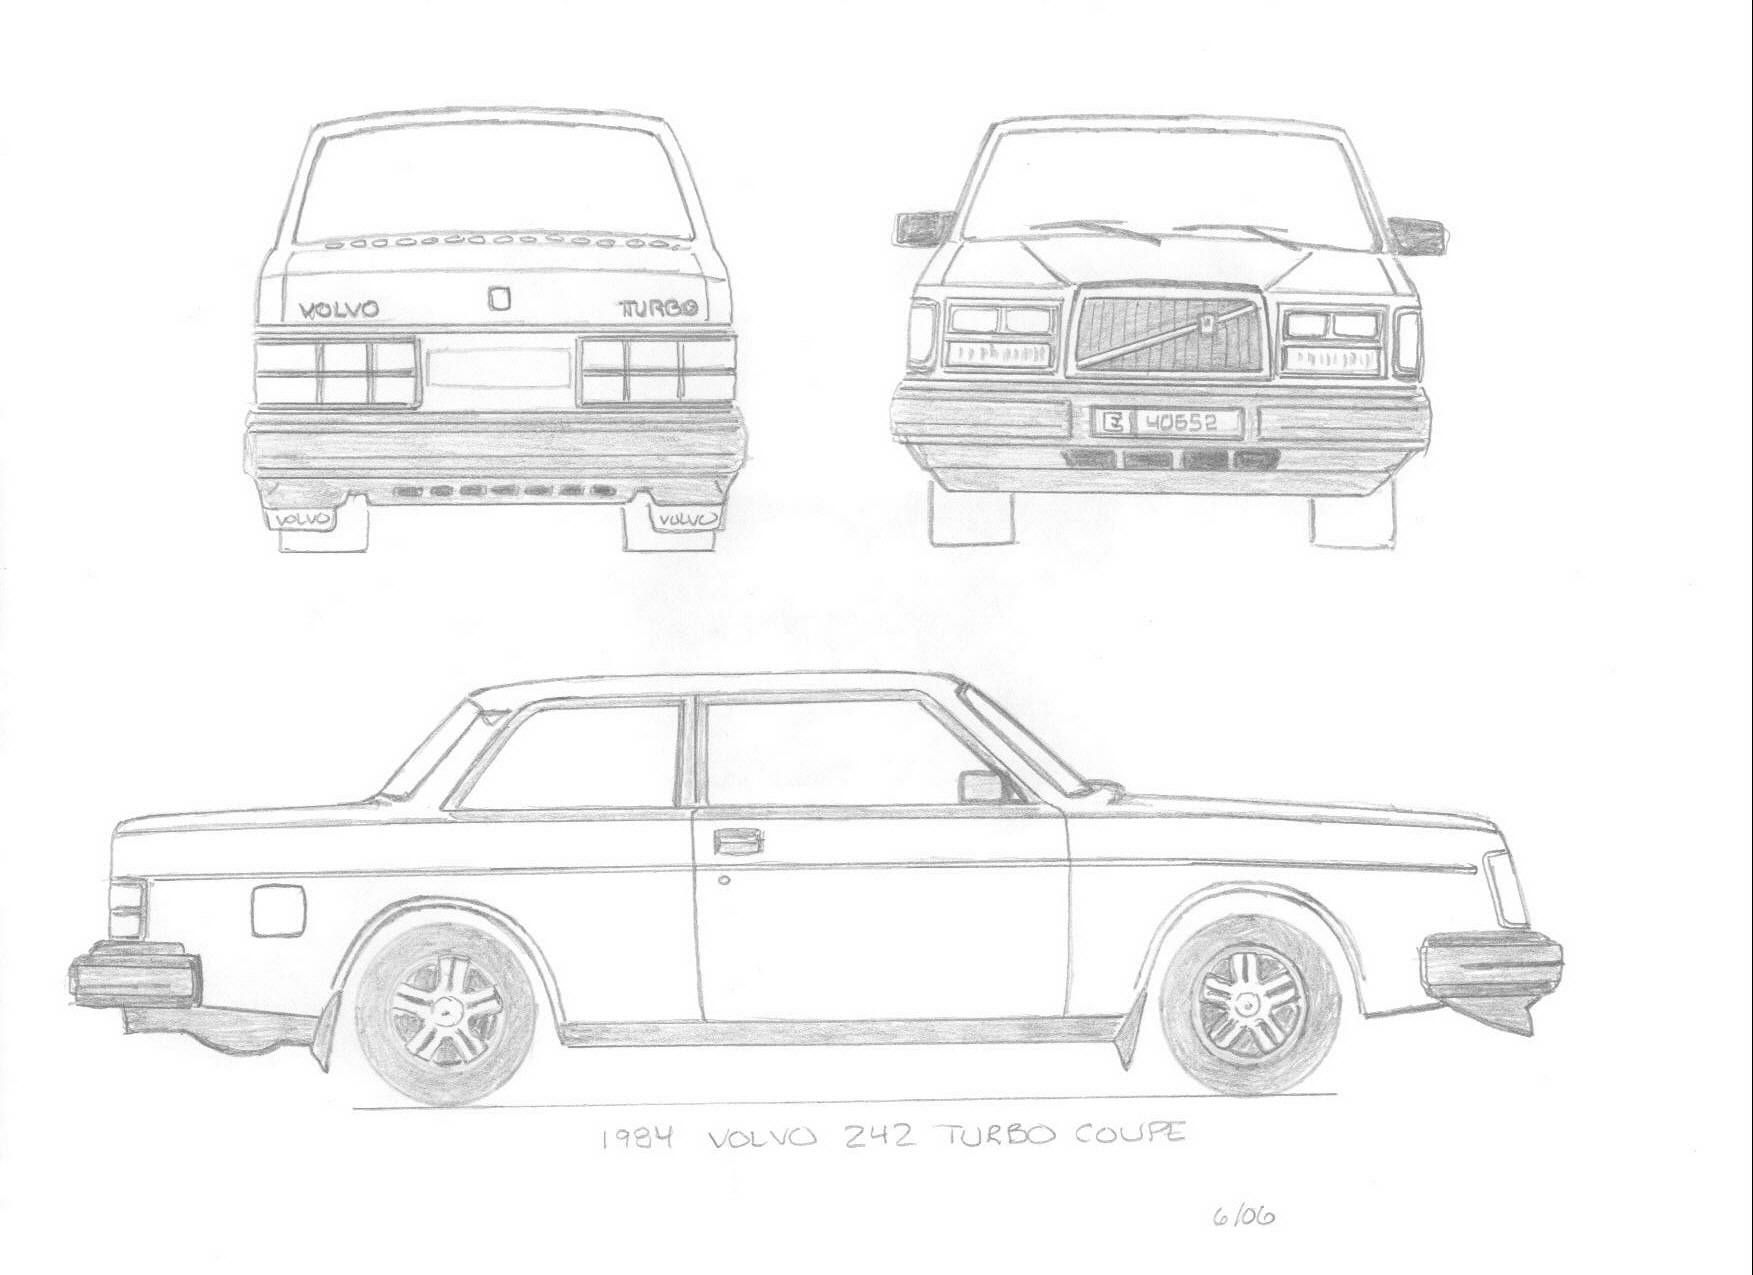 Volvo 240 blueprint google search volvos are my jam volvo 240 blueprint google search malvernweather Gallery